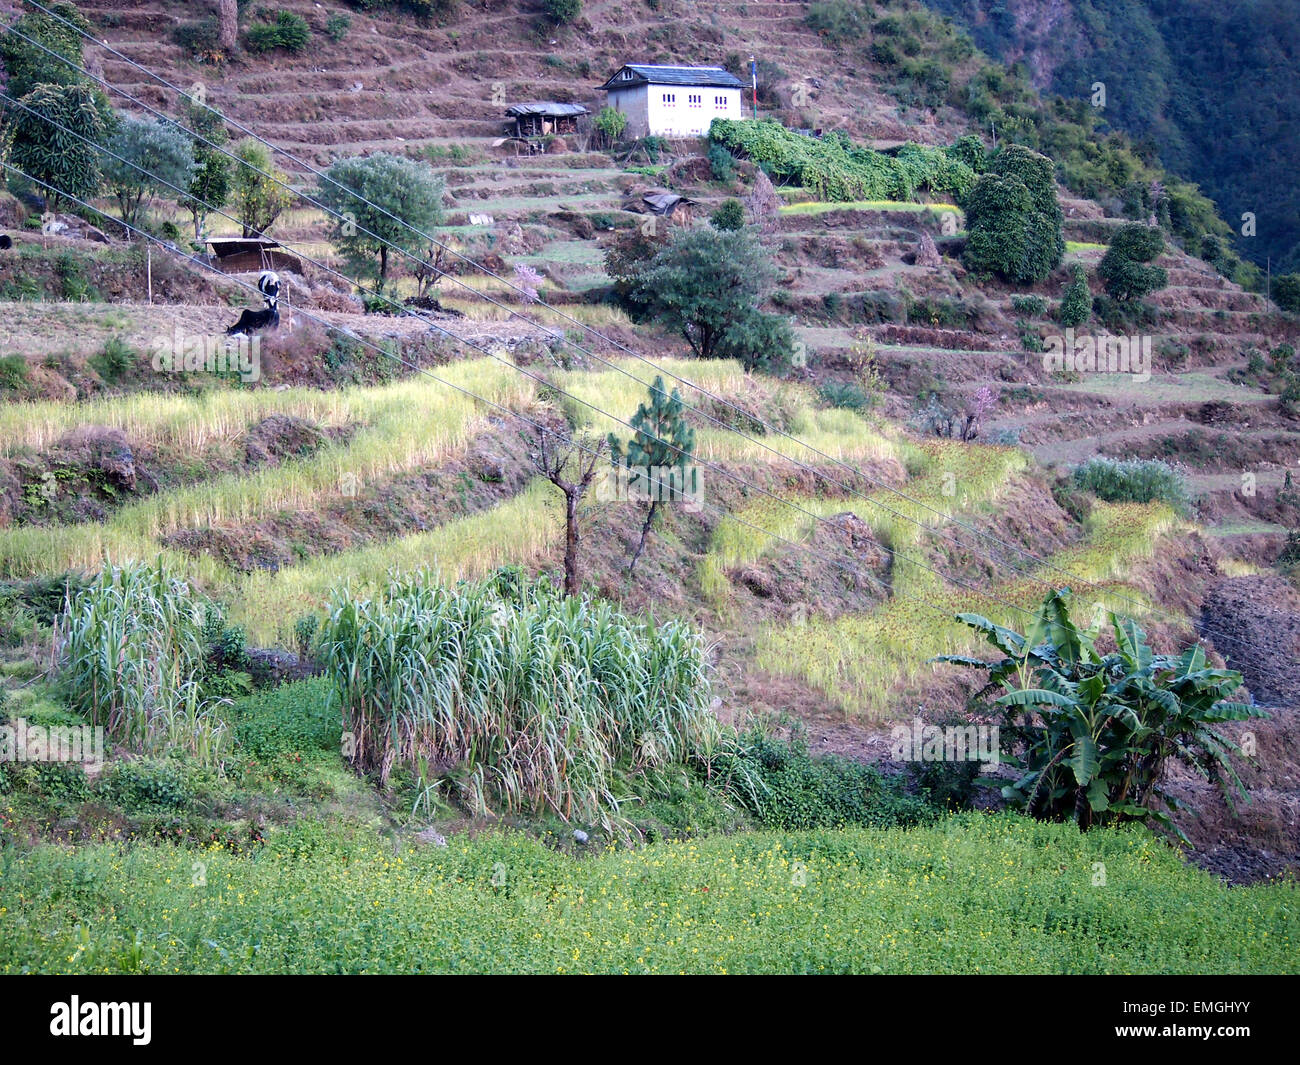 Terraced Fields Subsistence Farming Lukla Nepal Asia - Stock Image